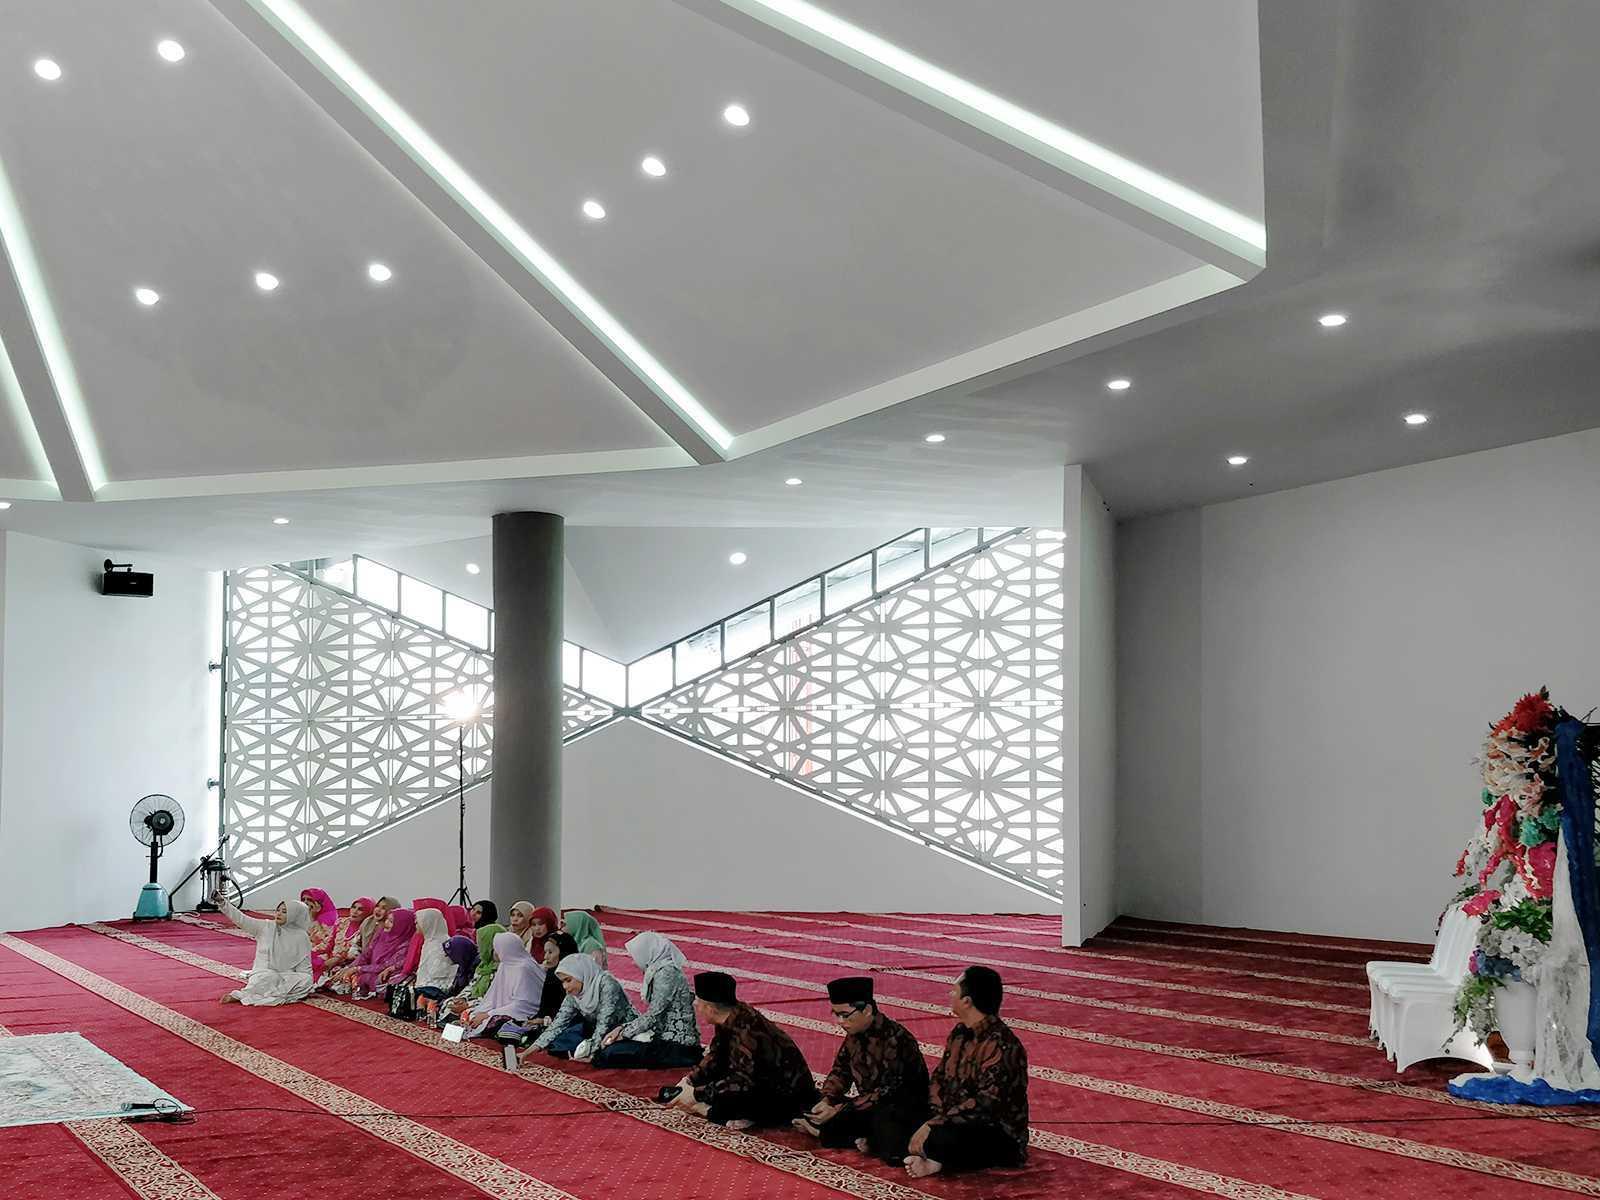 Bramasta Redy Masjid Apung Amahami Bima, Nusa Tenggara Bar., Indonesia Bima, Nusa Tenggara Bar., Indonesia Bramasta-Redy-Masjid-Apung-Amahami   65773